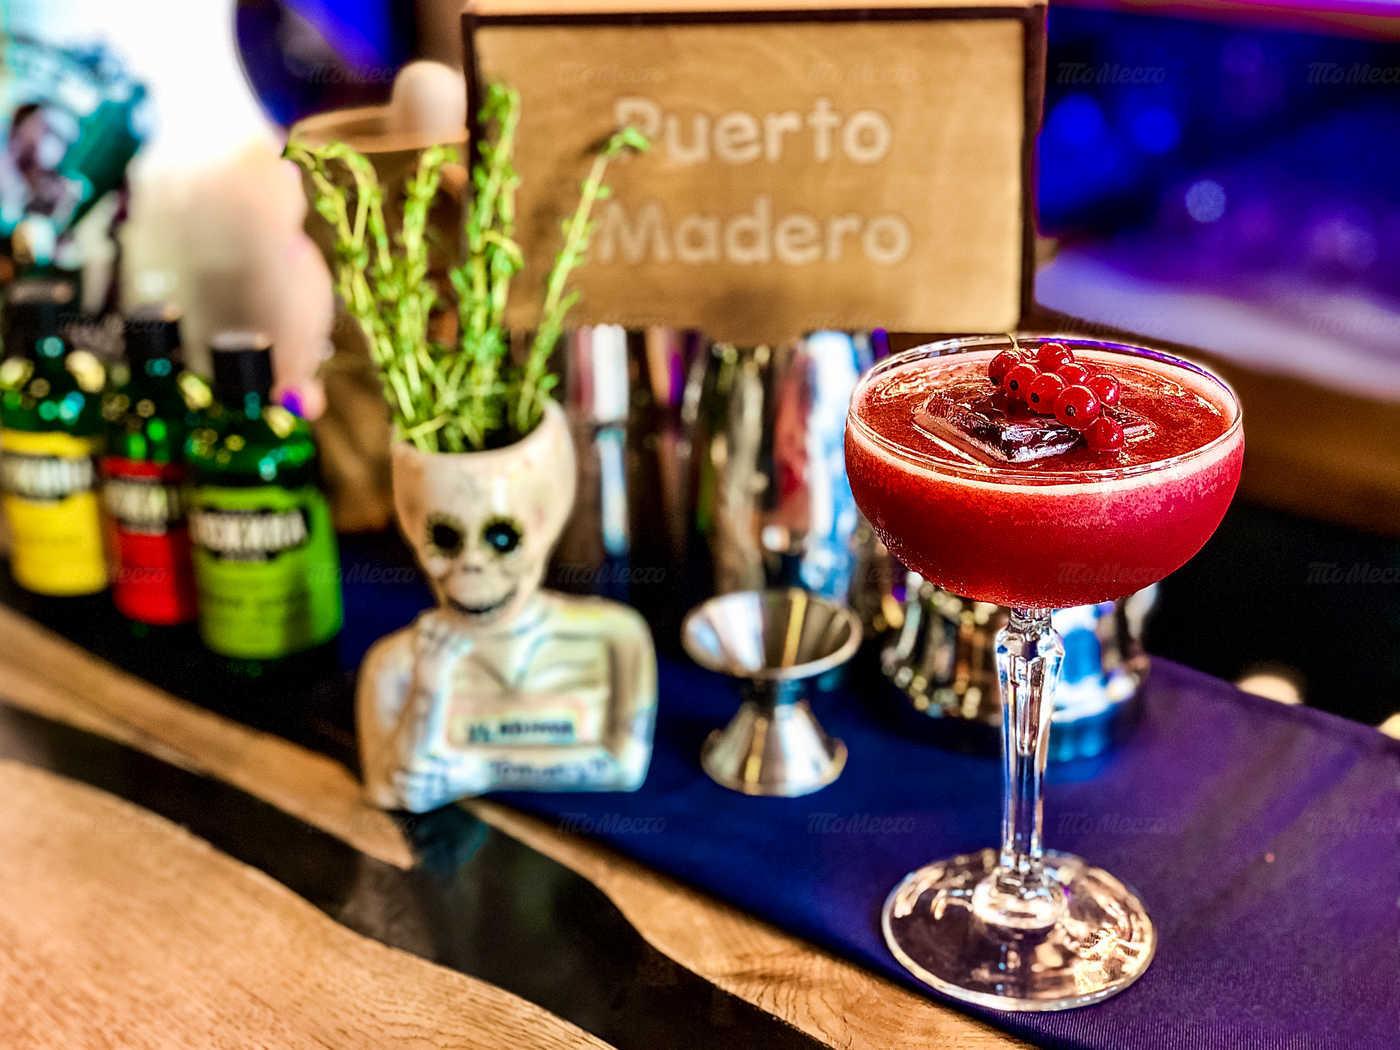 Меню ресторана Puerto Madero (Пуэрто Мадеро) на Ходынском бульваре фото 13